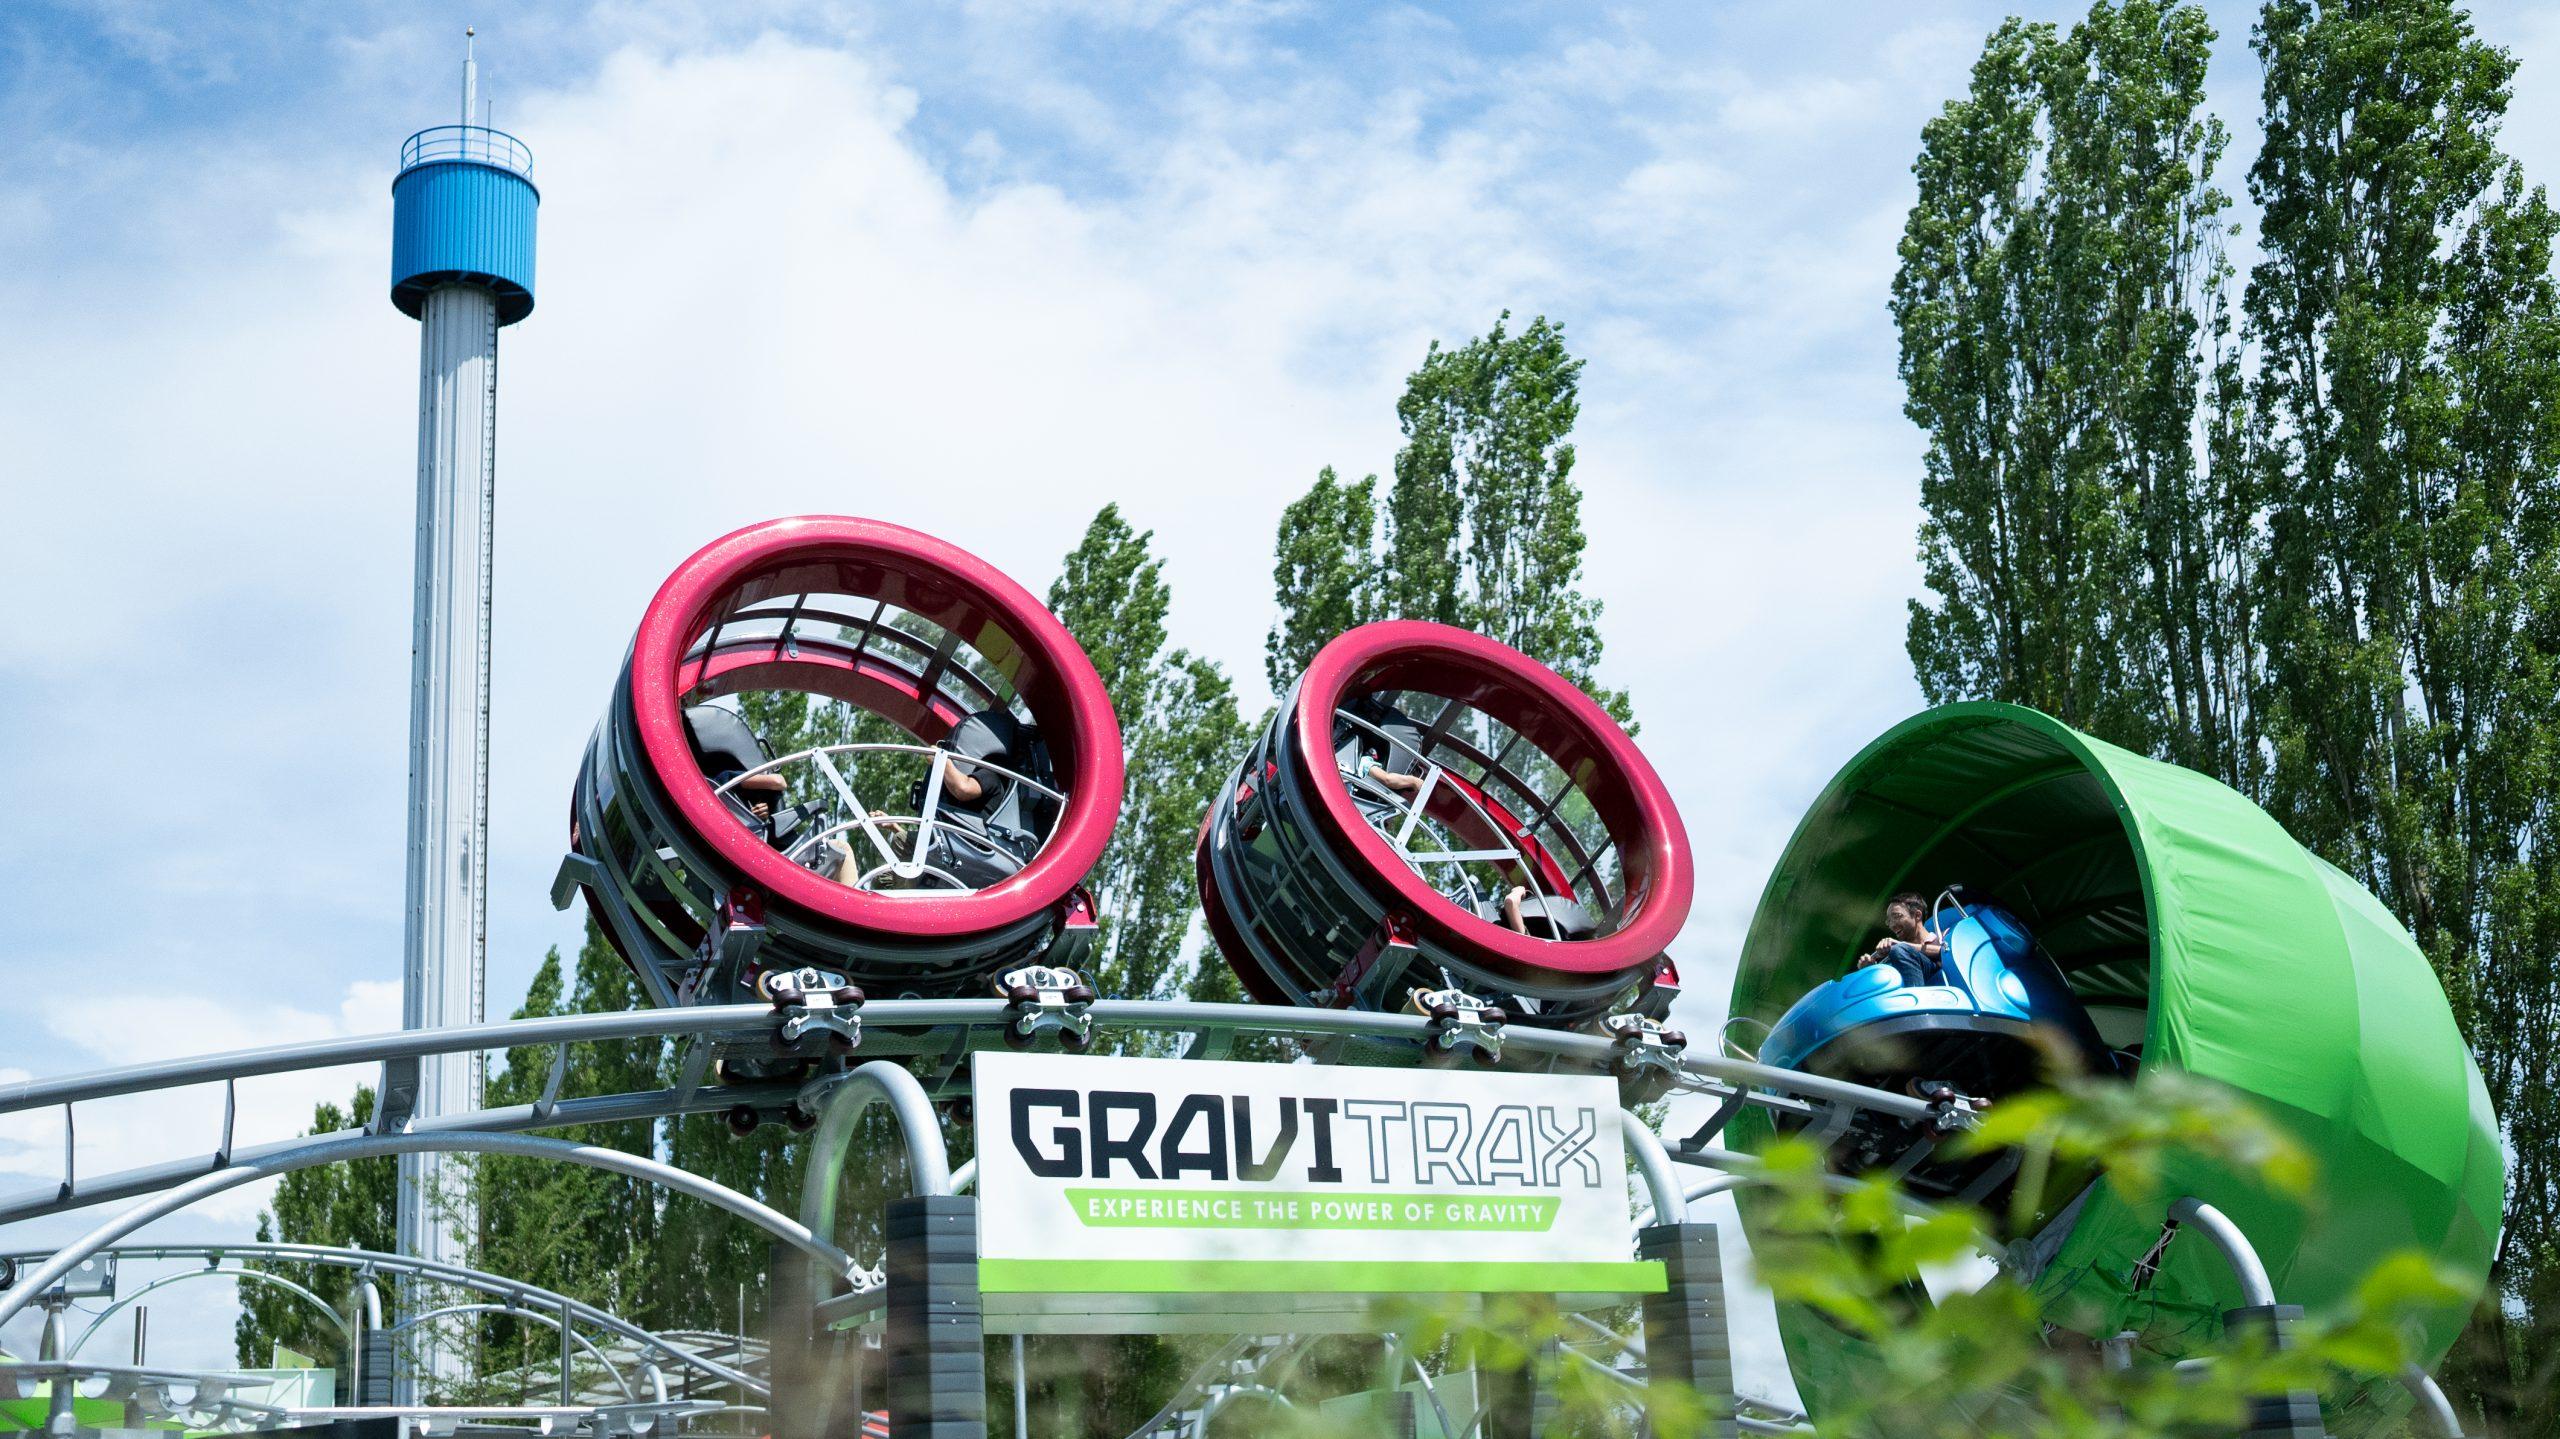 (c)Ravensburger Spieleland GraviTrax-Kugelbahn